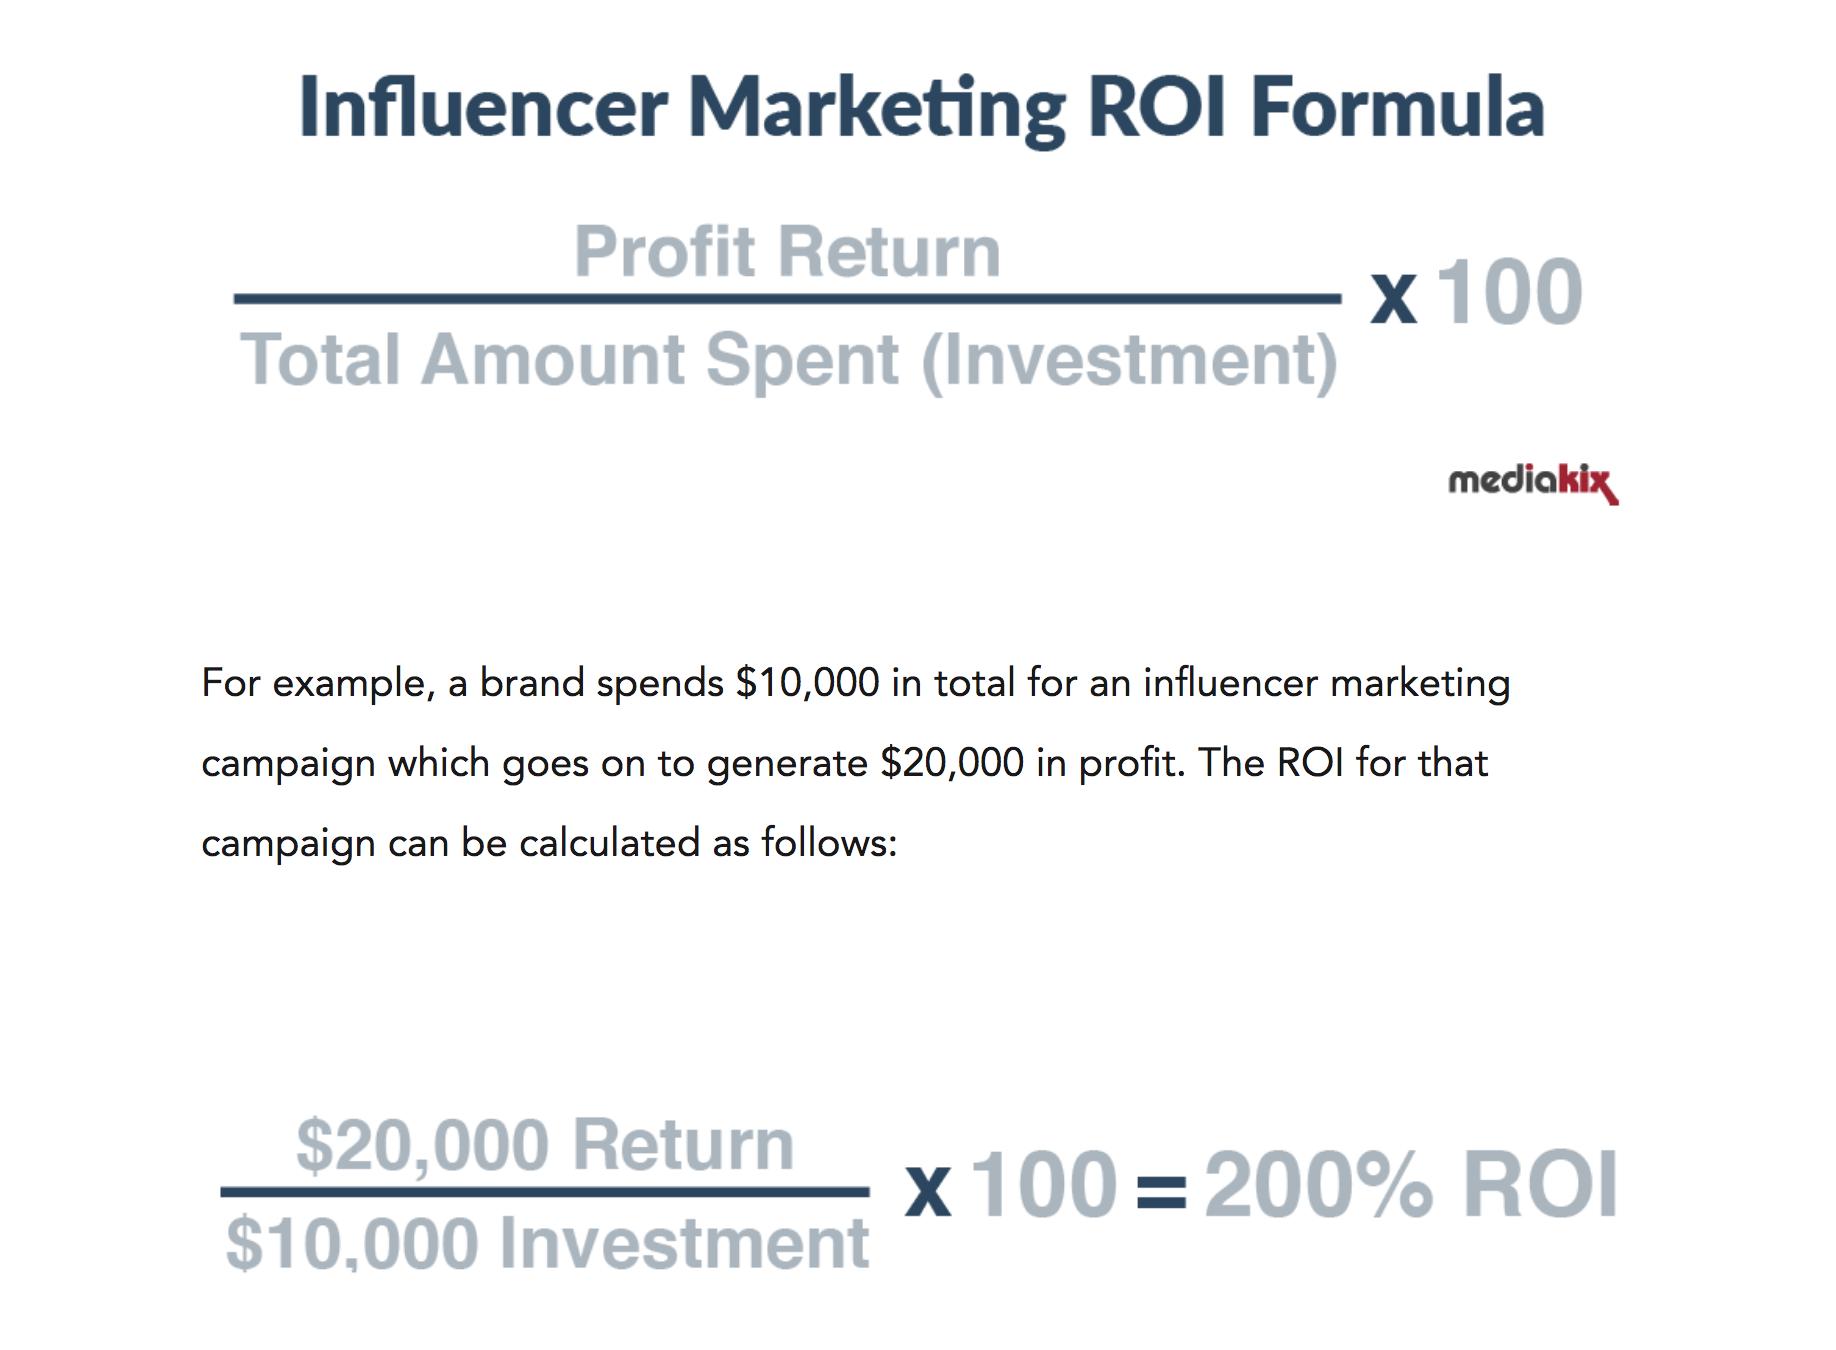 https://mediakix.com/influencer-marketing-resources/influencer-marketing-roi/